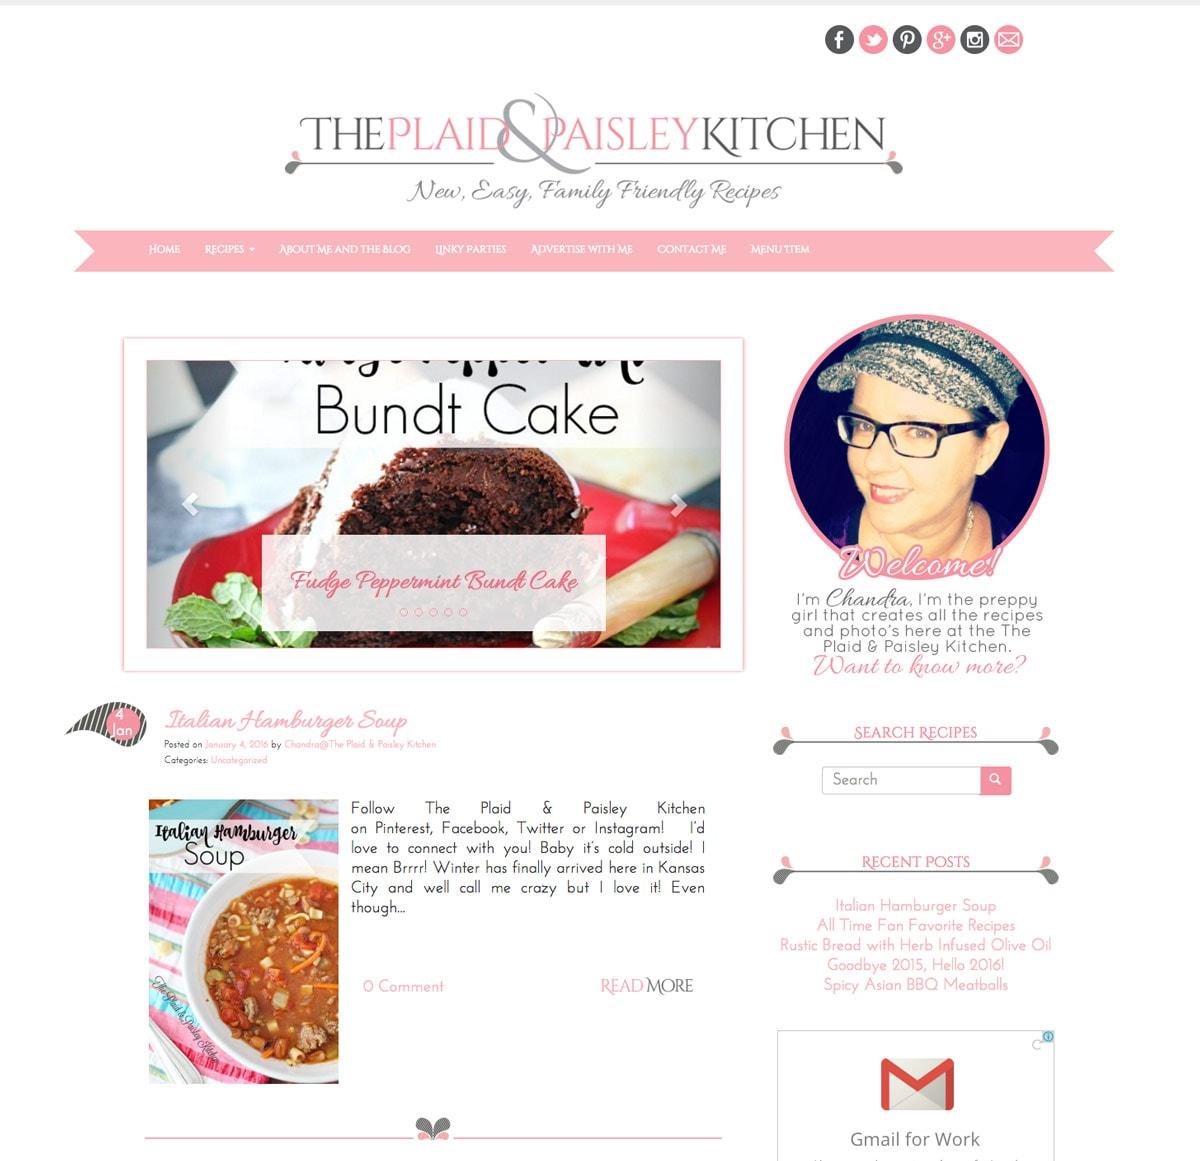 The Plaid & Paisley Kitchen Blog